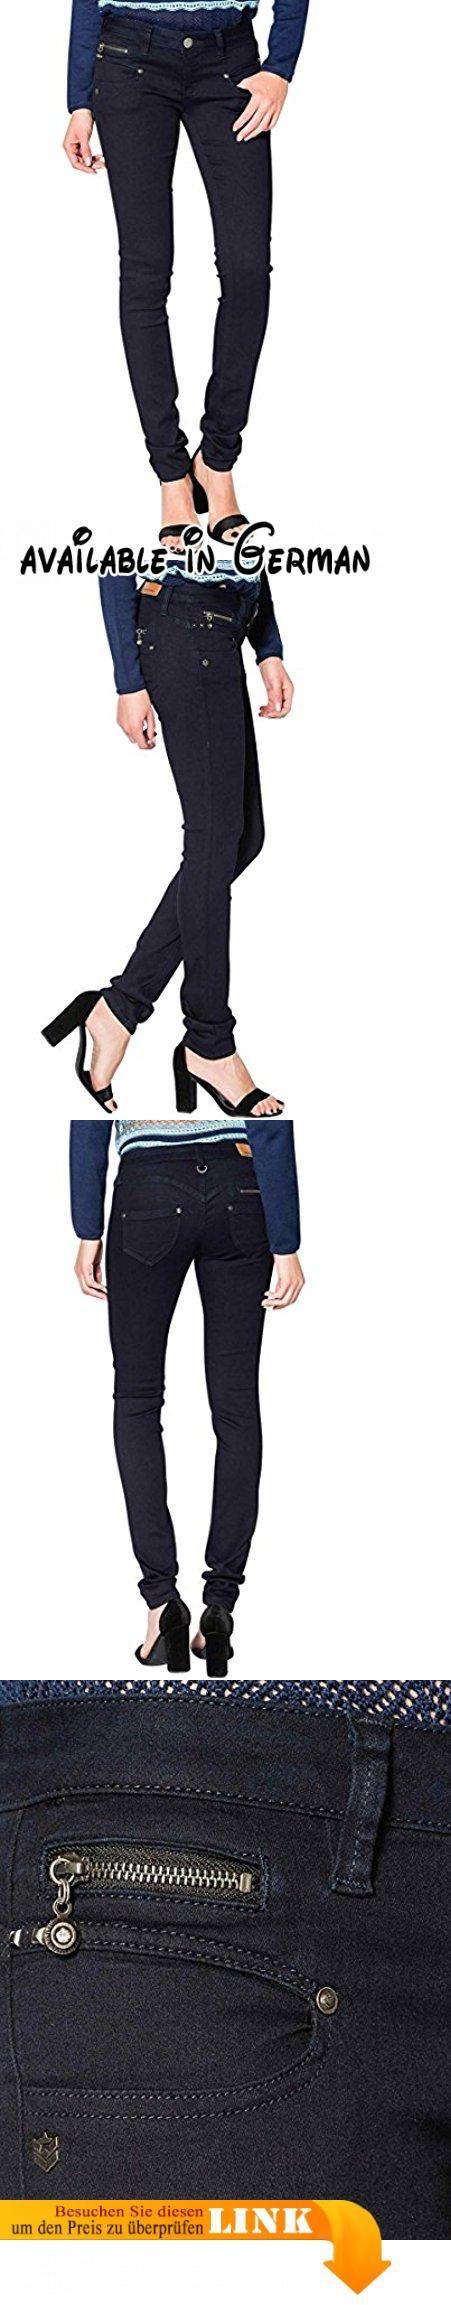 Freeman T. Porter Alexa Super Stretch Denim flora Größe XS. Freeman T. Porter Damen Jeans Alexa Super Stretch flora #Apparel #PANTS